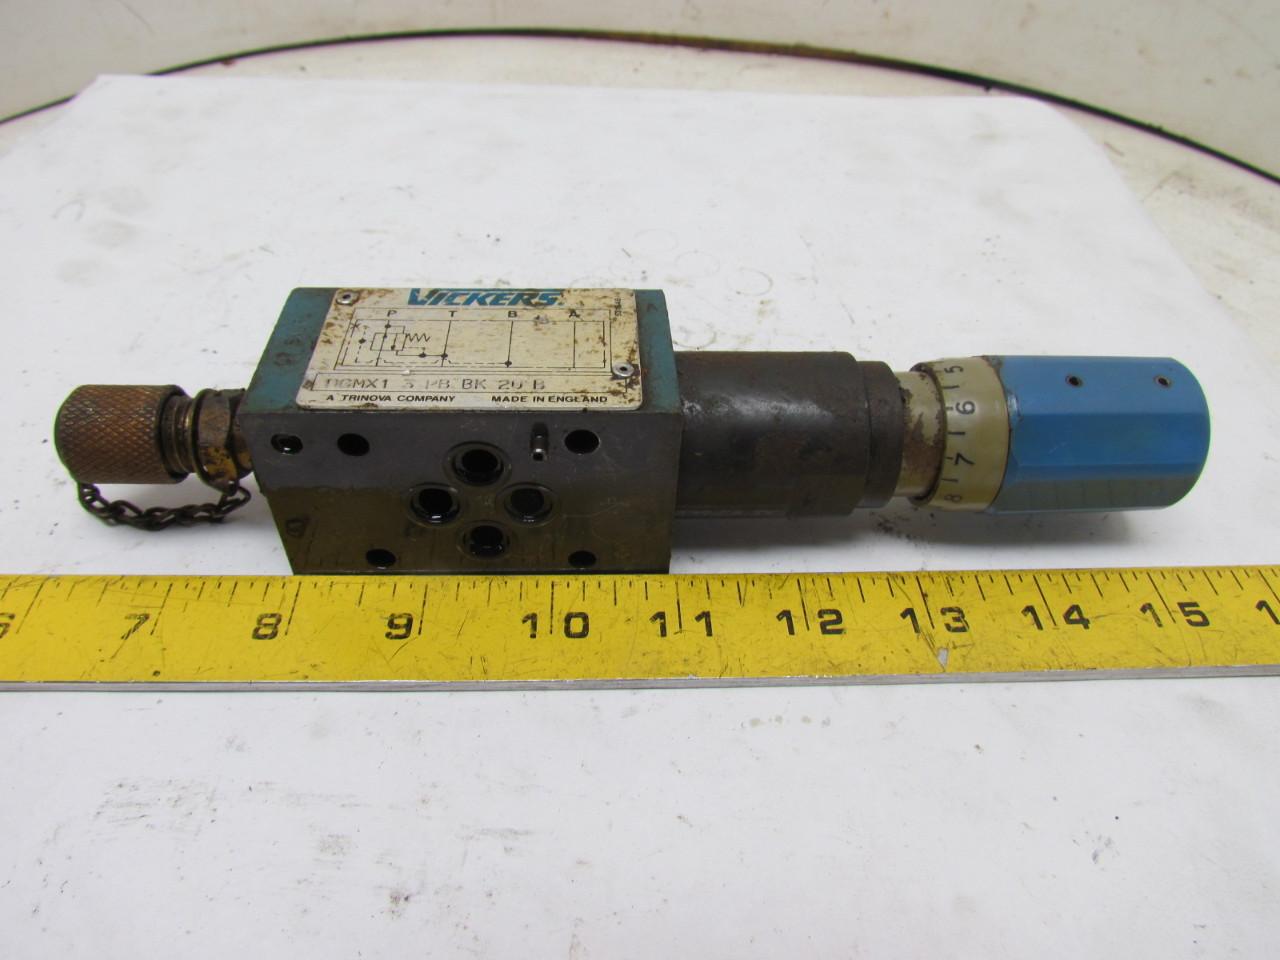 Vickers DGMX1 3 PB BK 20 B Pressure Reducing Hydraulic Valve Keyed